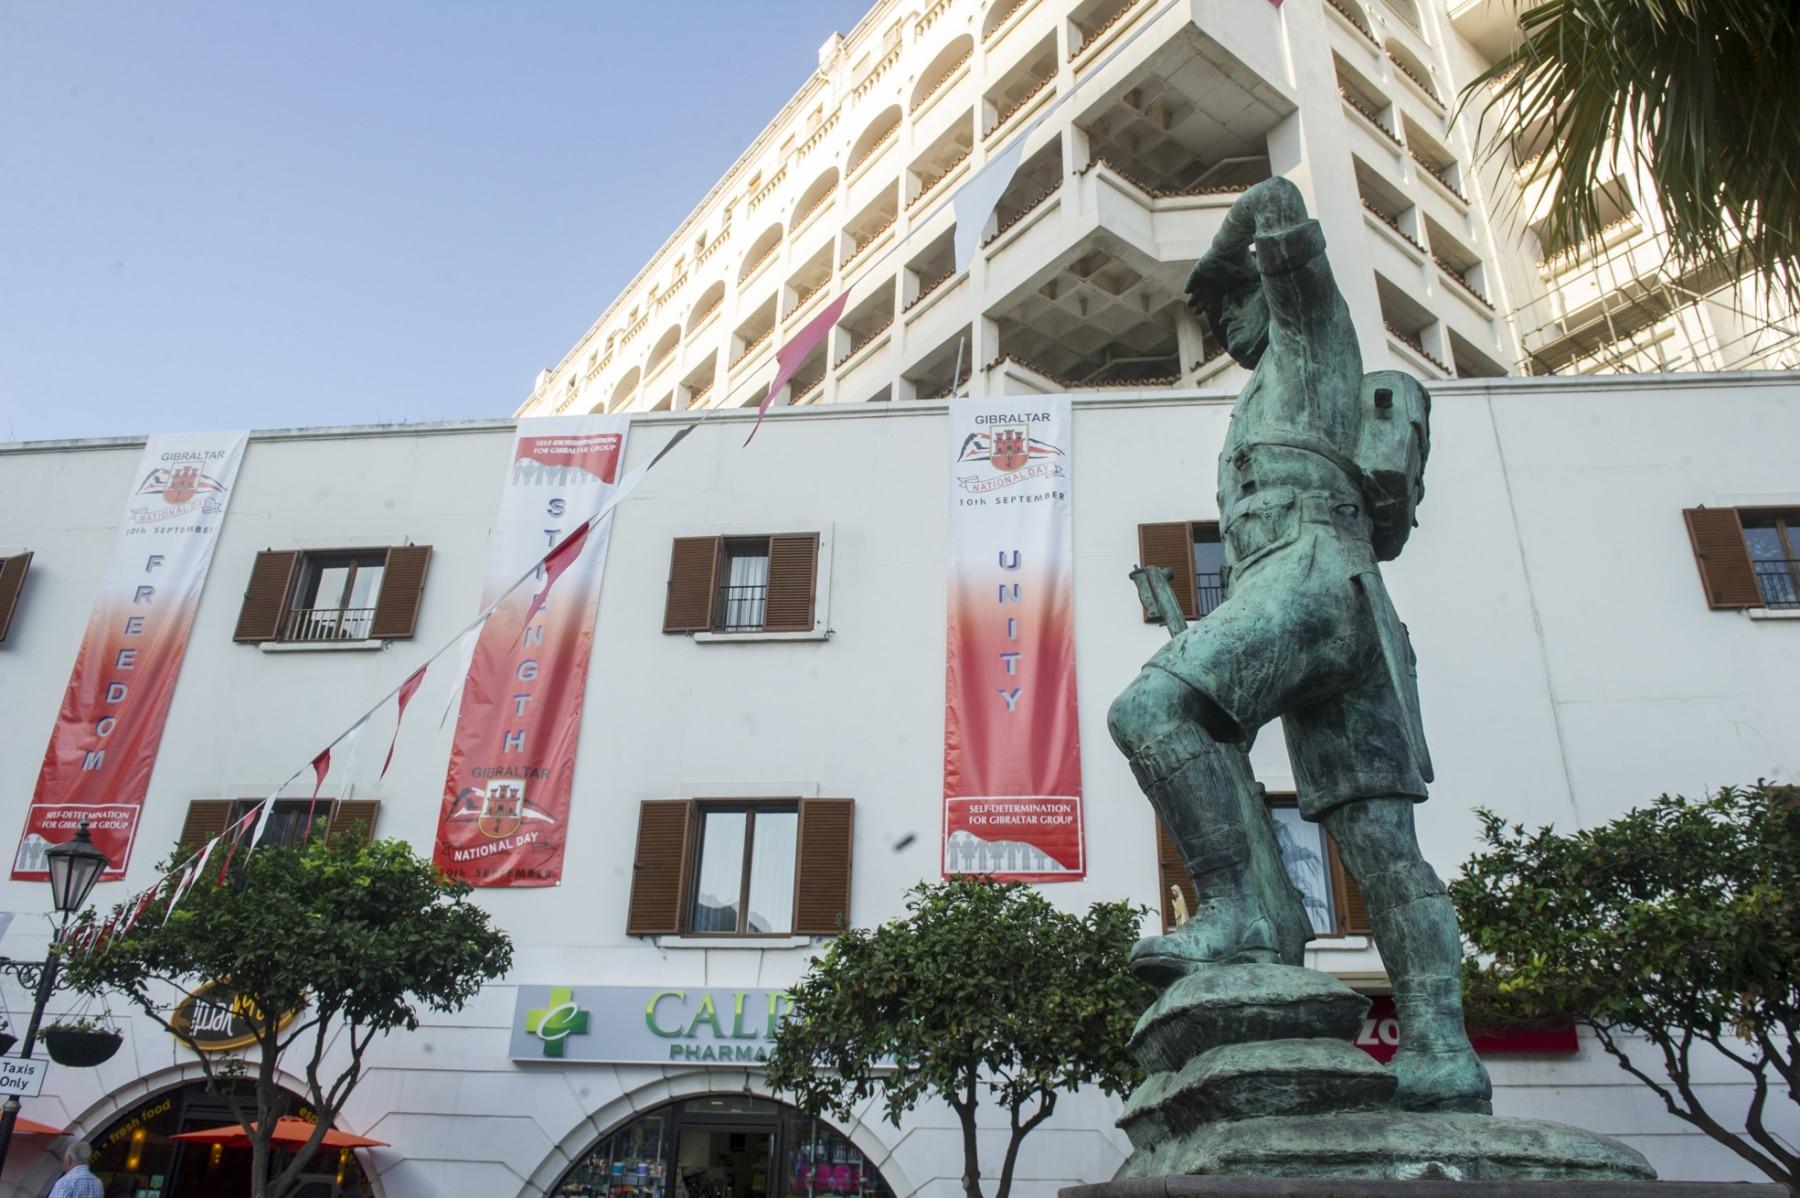 monumento-situado-en-la-plaza-de-casemates-en-gibraltar-en-honor-a-los-gibraltareos-que-participaron-como-voluntarios-en-la-ii-guerra-mundial_22751645041_o